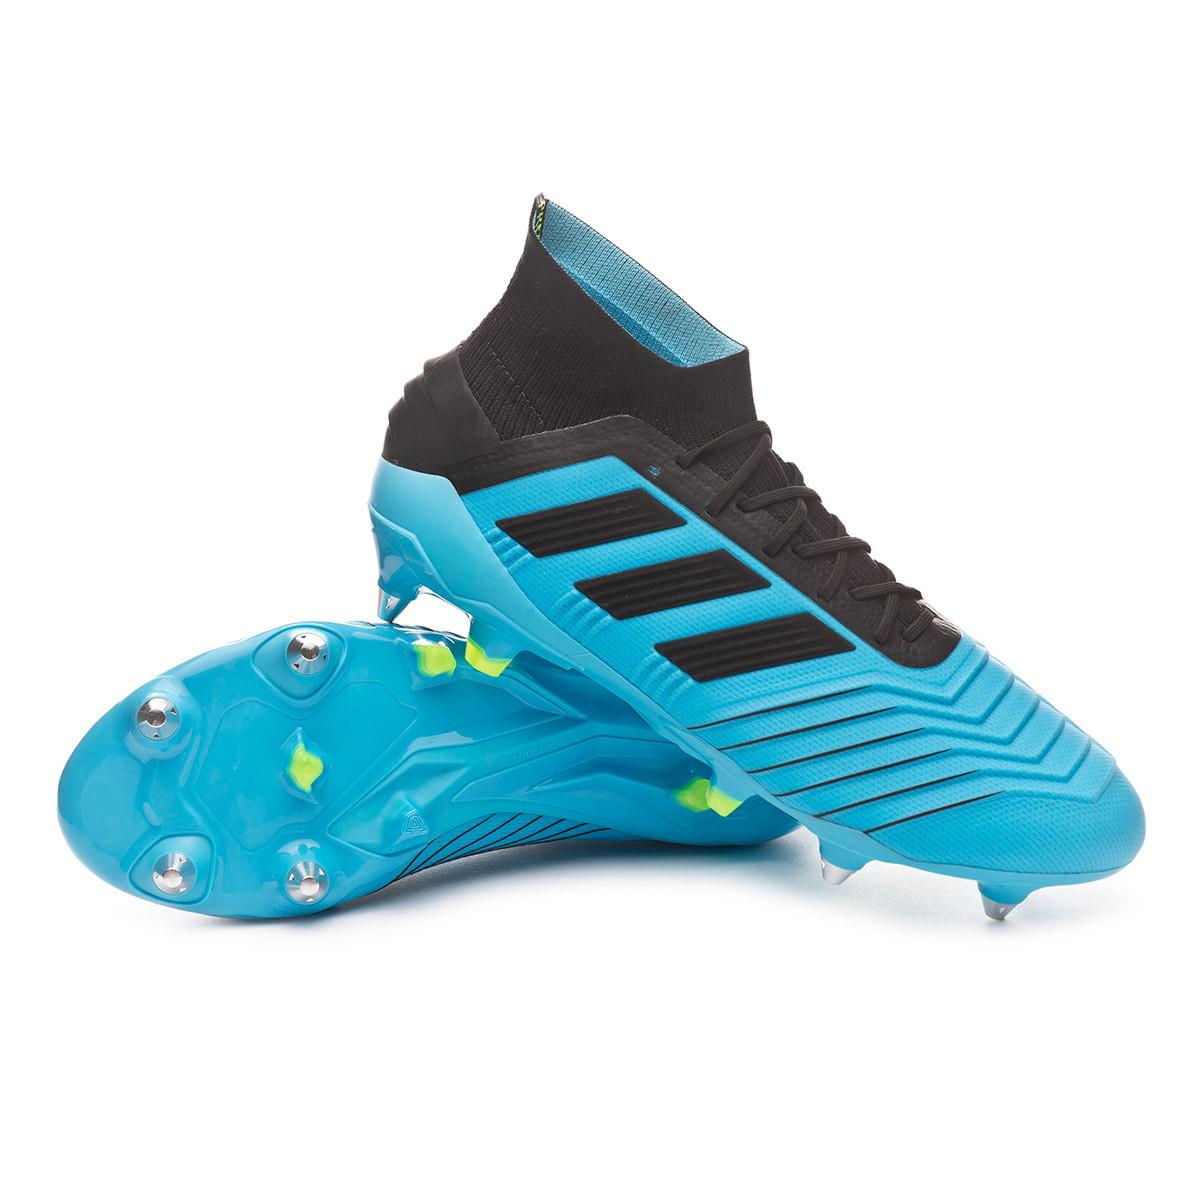 chaussures de foot adidas sg